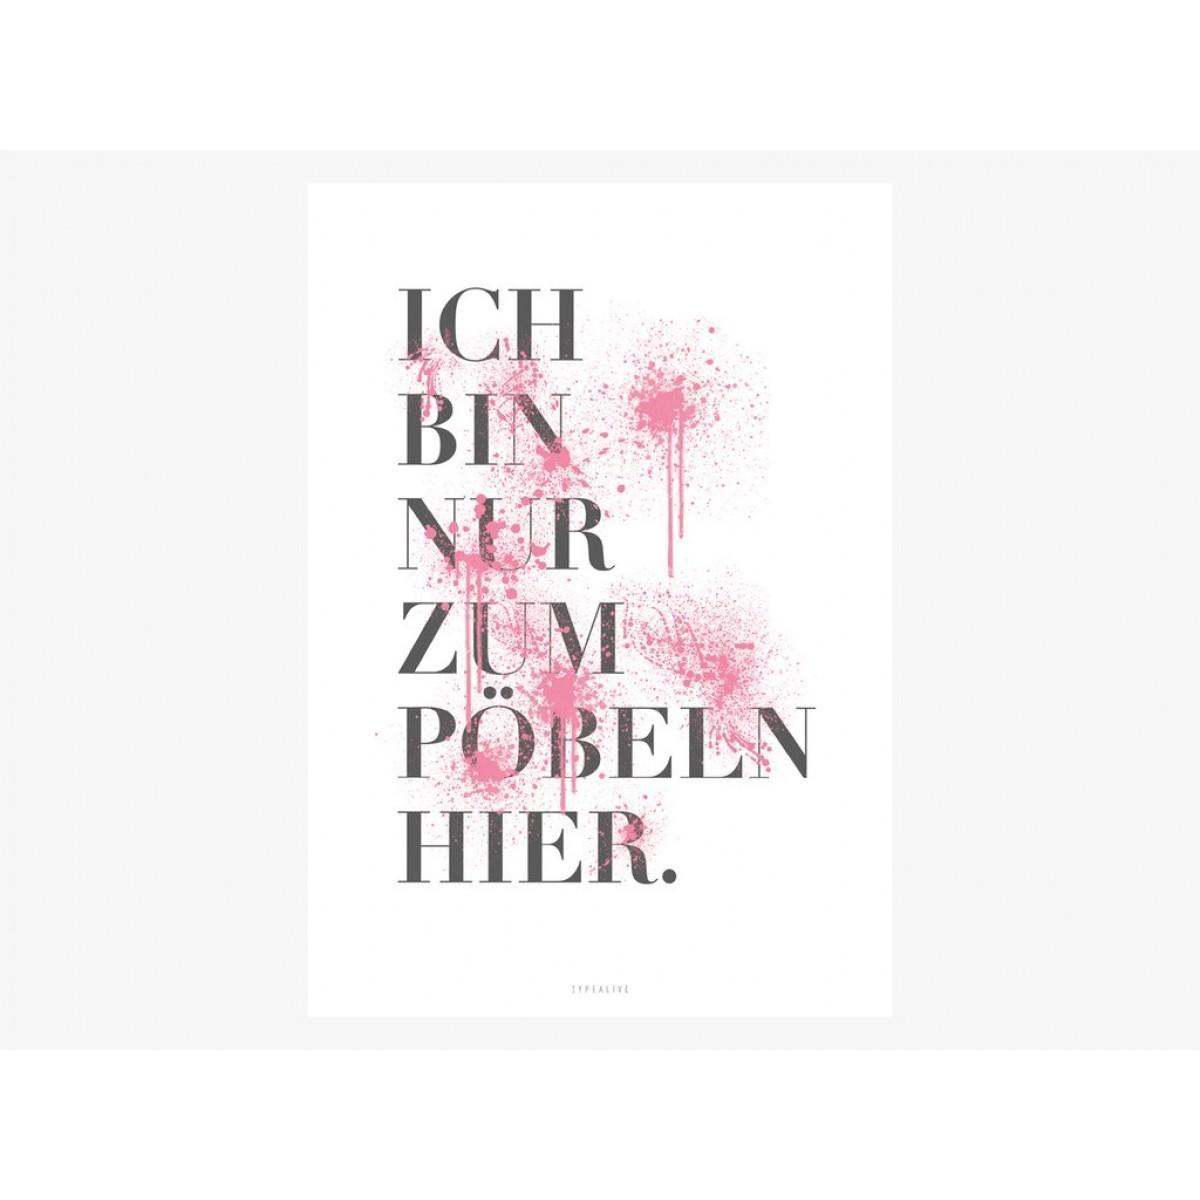 typealive / Pöbeln